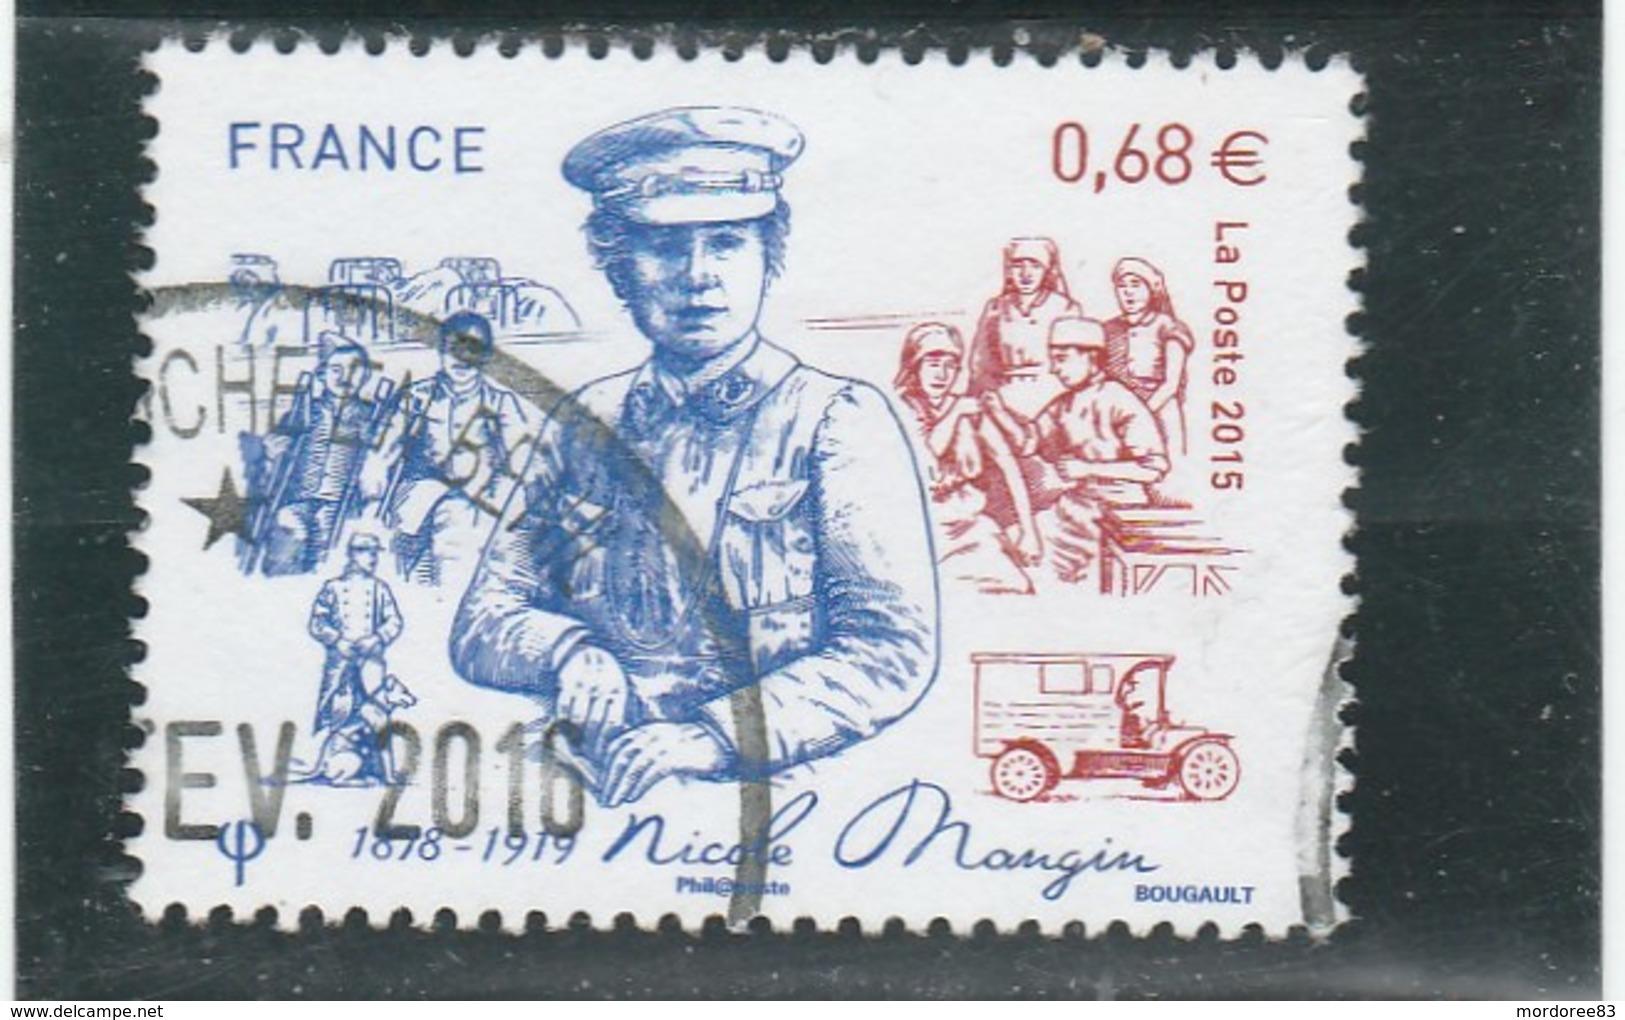 FRANCE 2015 NICOLE MANGIN 1878-1919 OBLITERE A DATE YT 4936 - - France